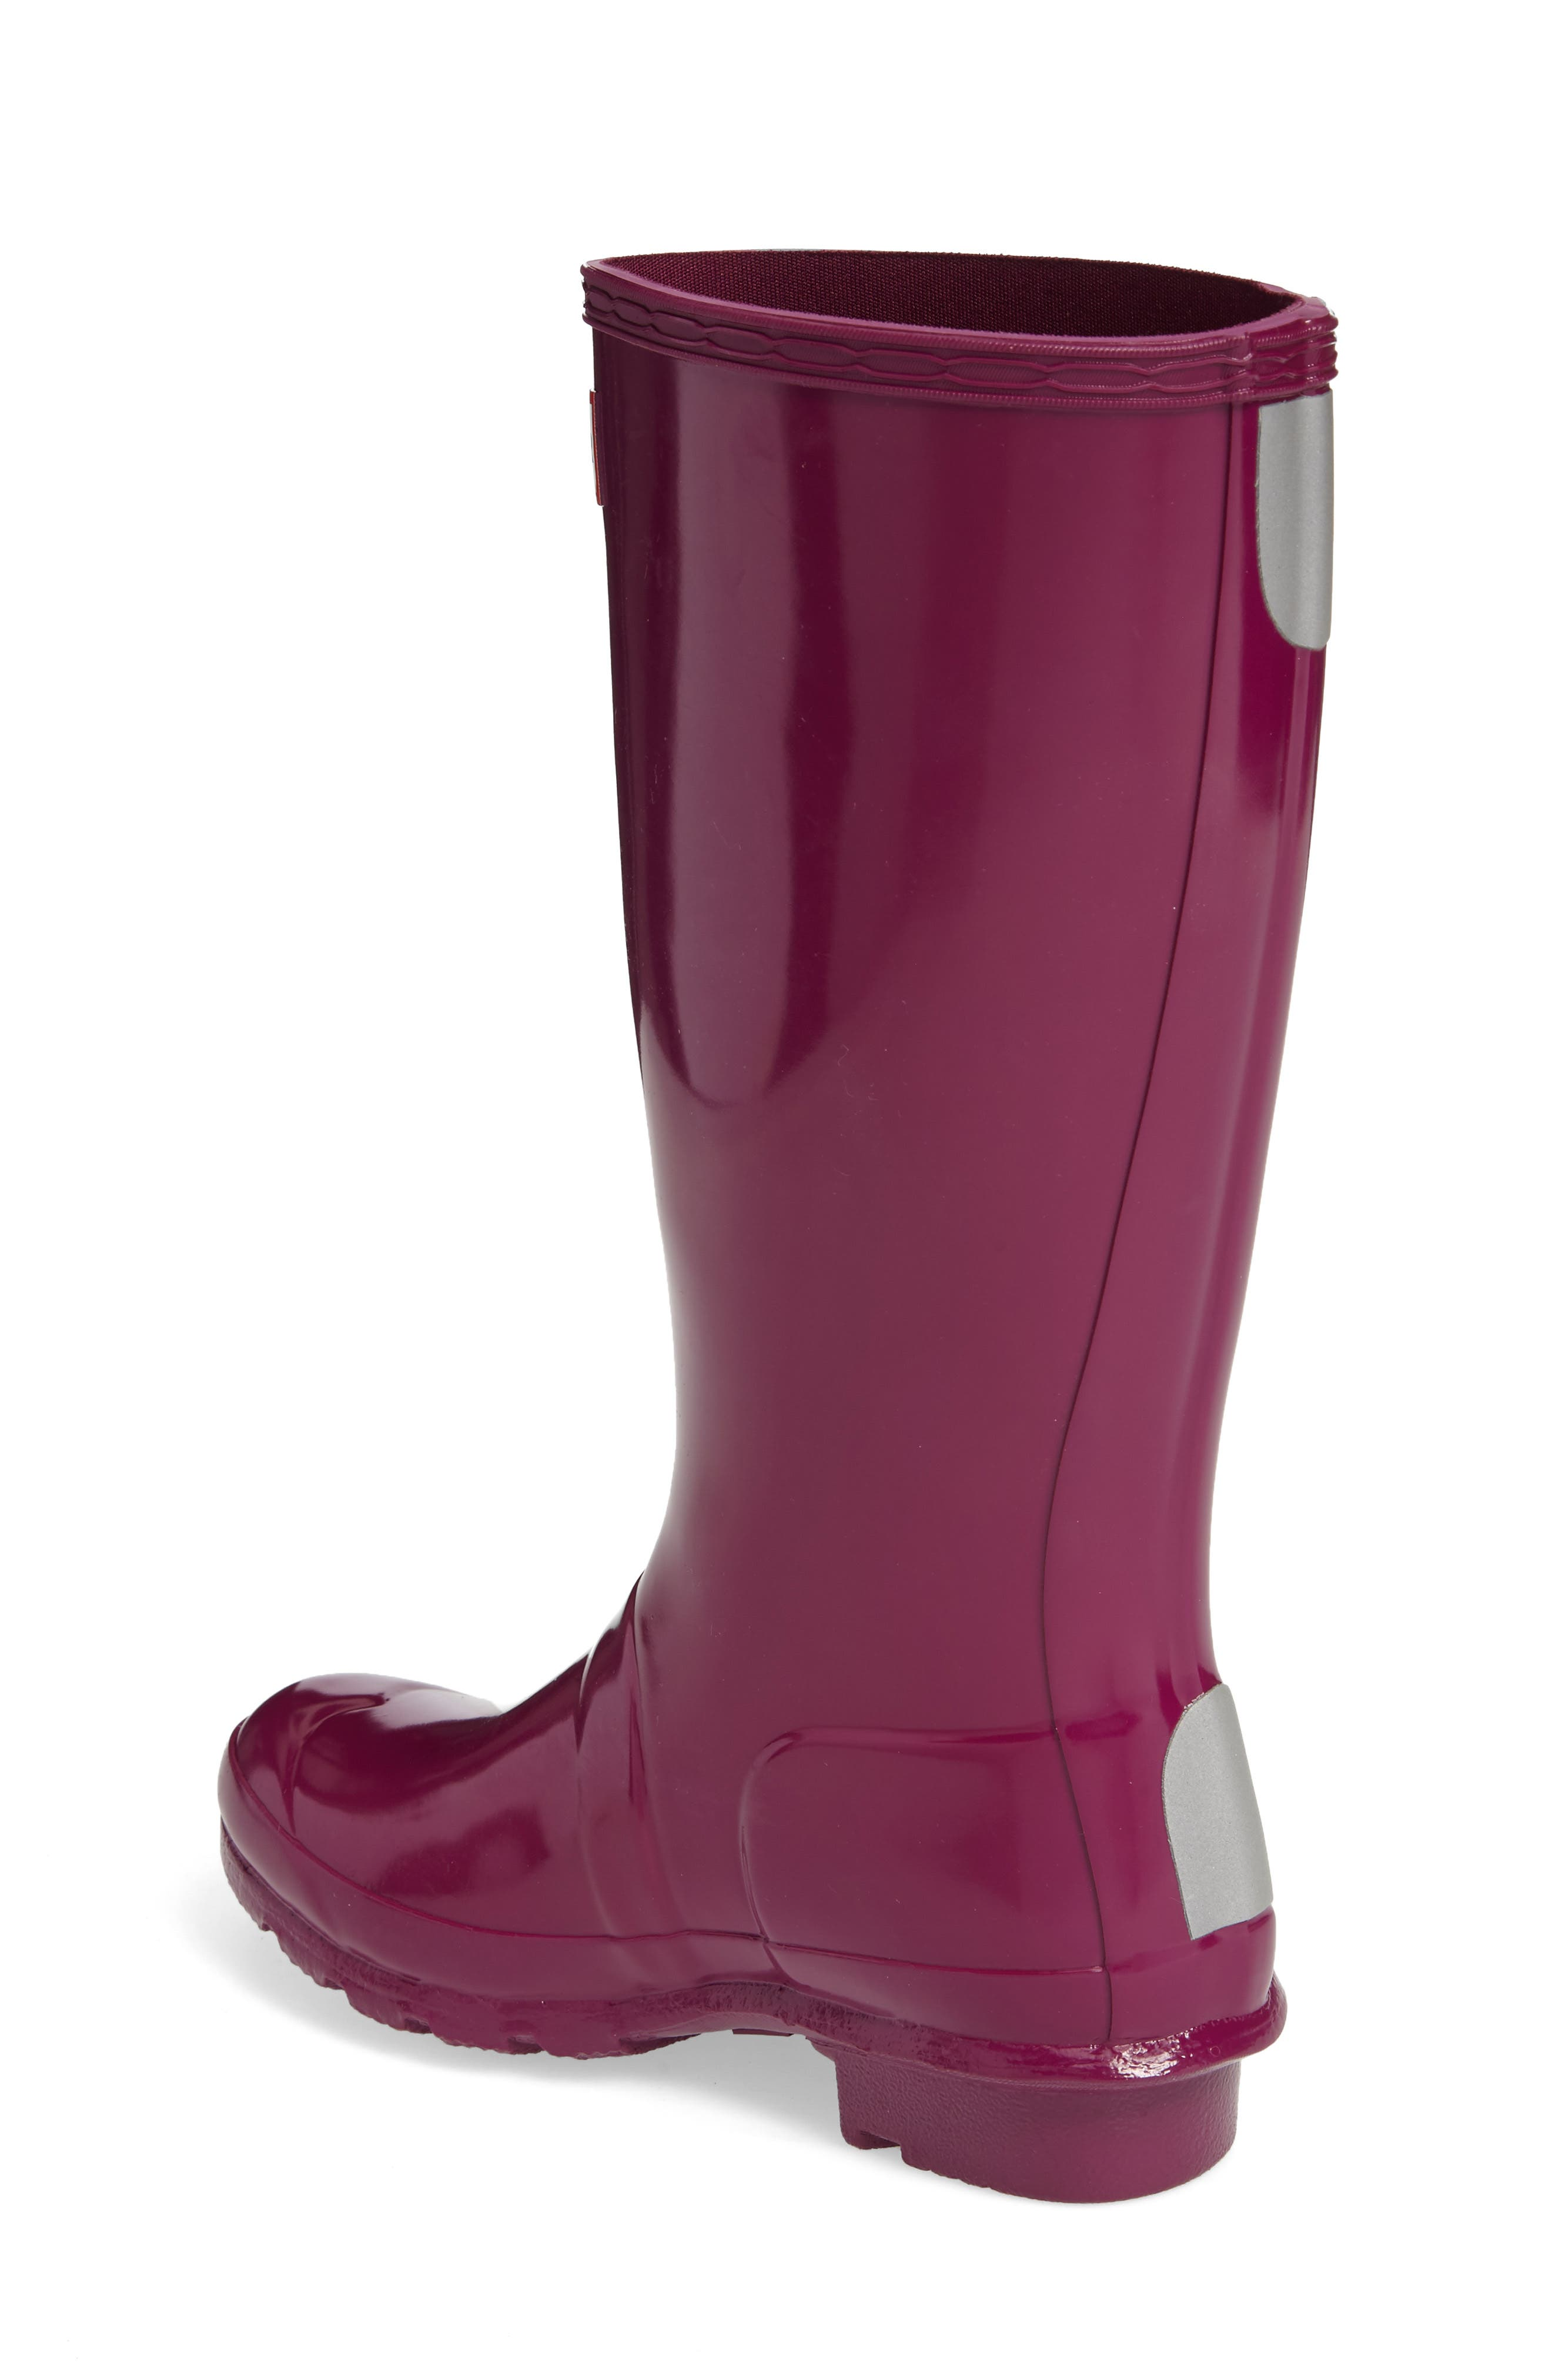 Alternate Image 2  - Hunter 'Original Gloss' Rain Boot (Little Kid & Big Kid)